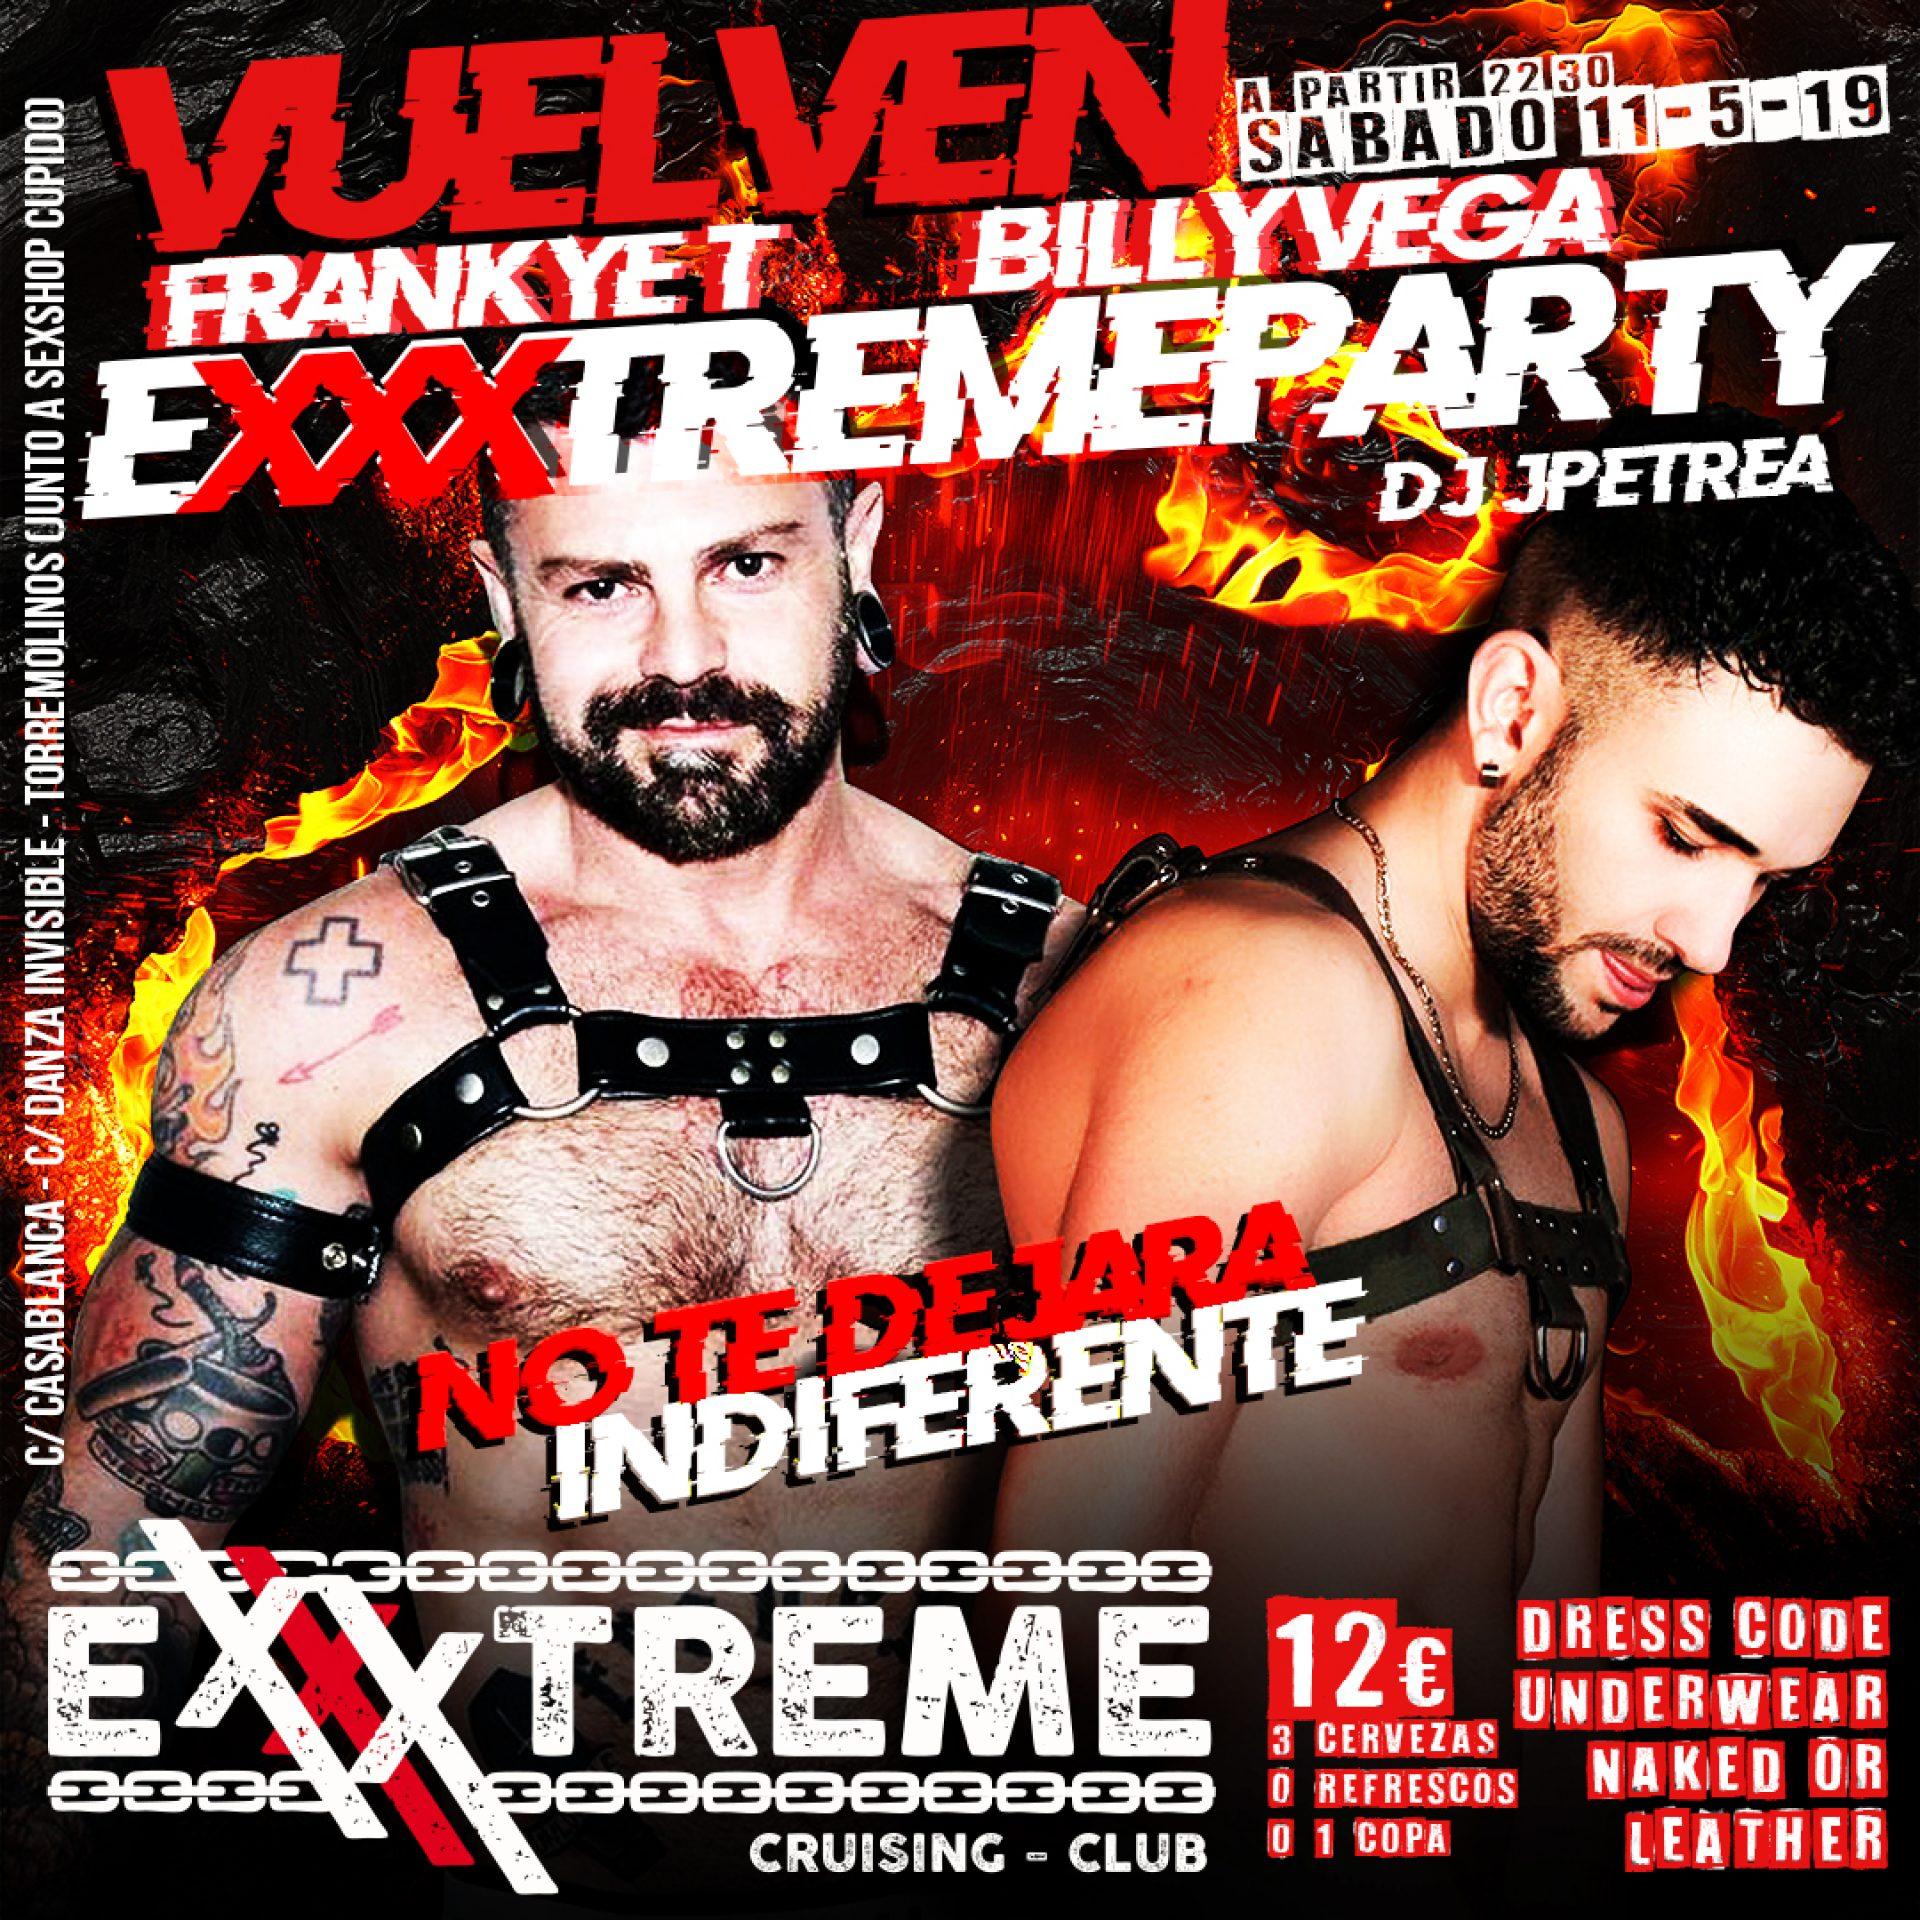 11 de mayo VUELVE LA FIESTA EXXXTREMA A EXXXTREME